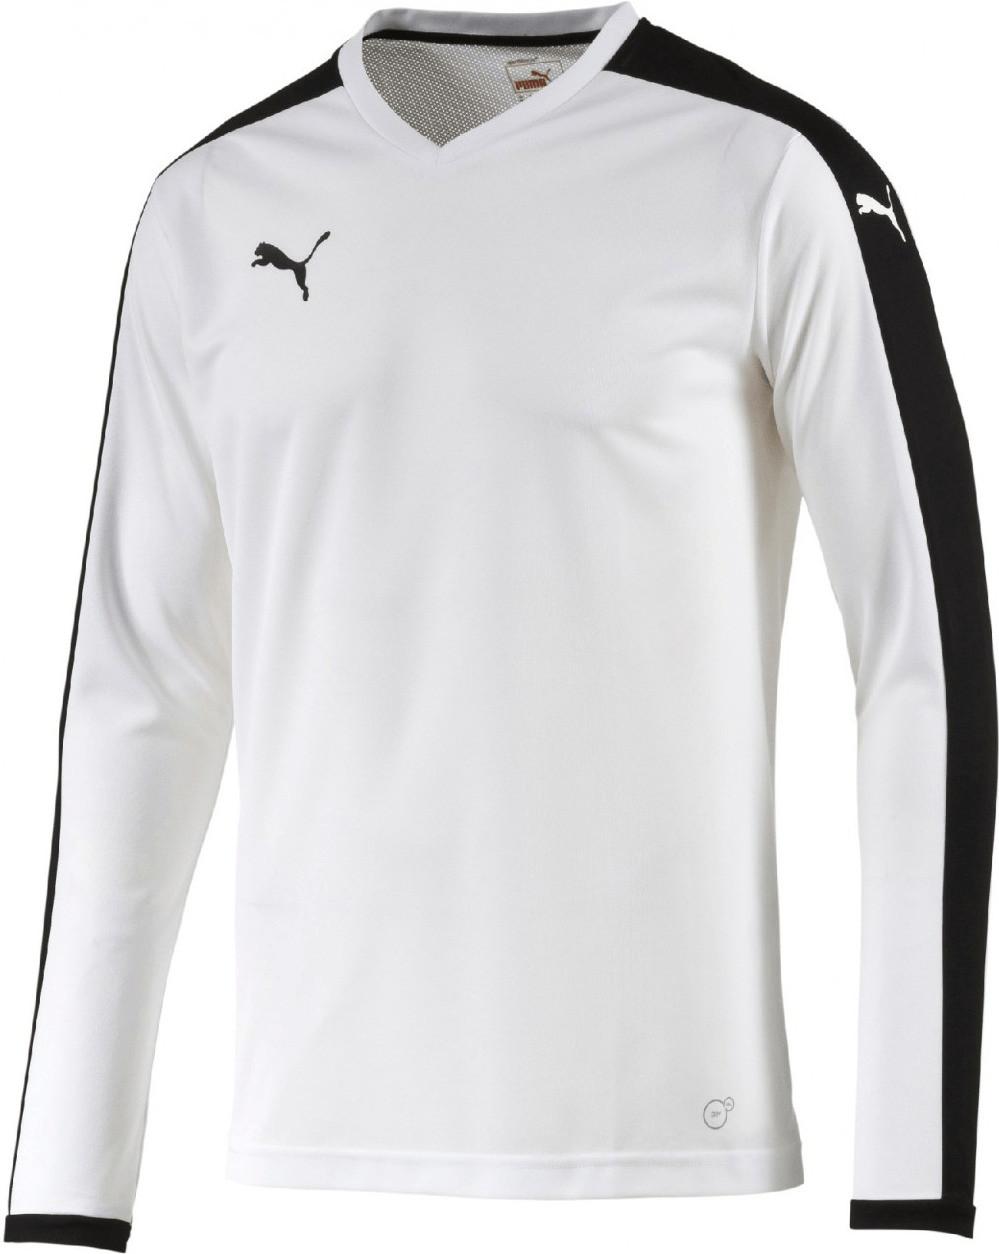 Puma Fußball Longsleeve Trikot white/black